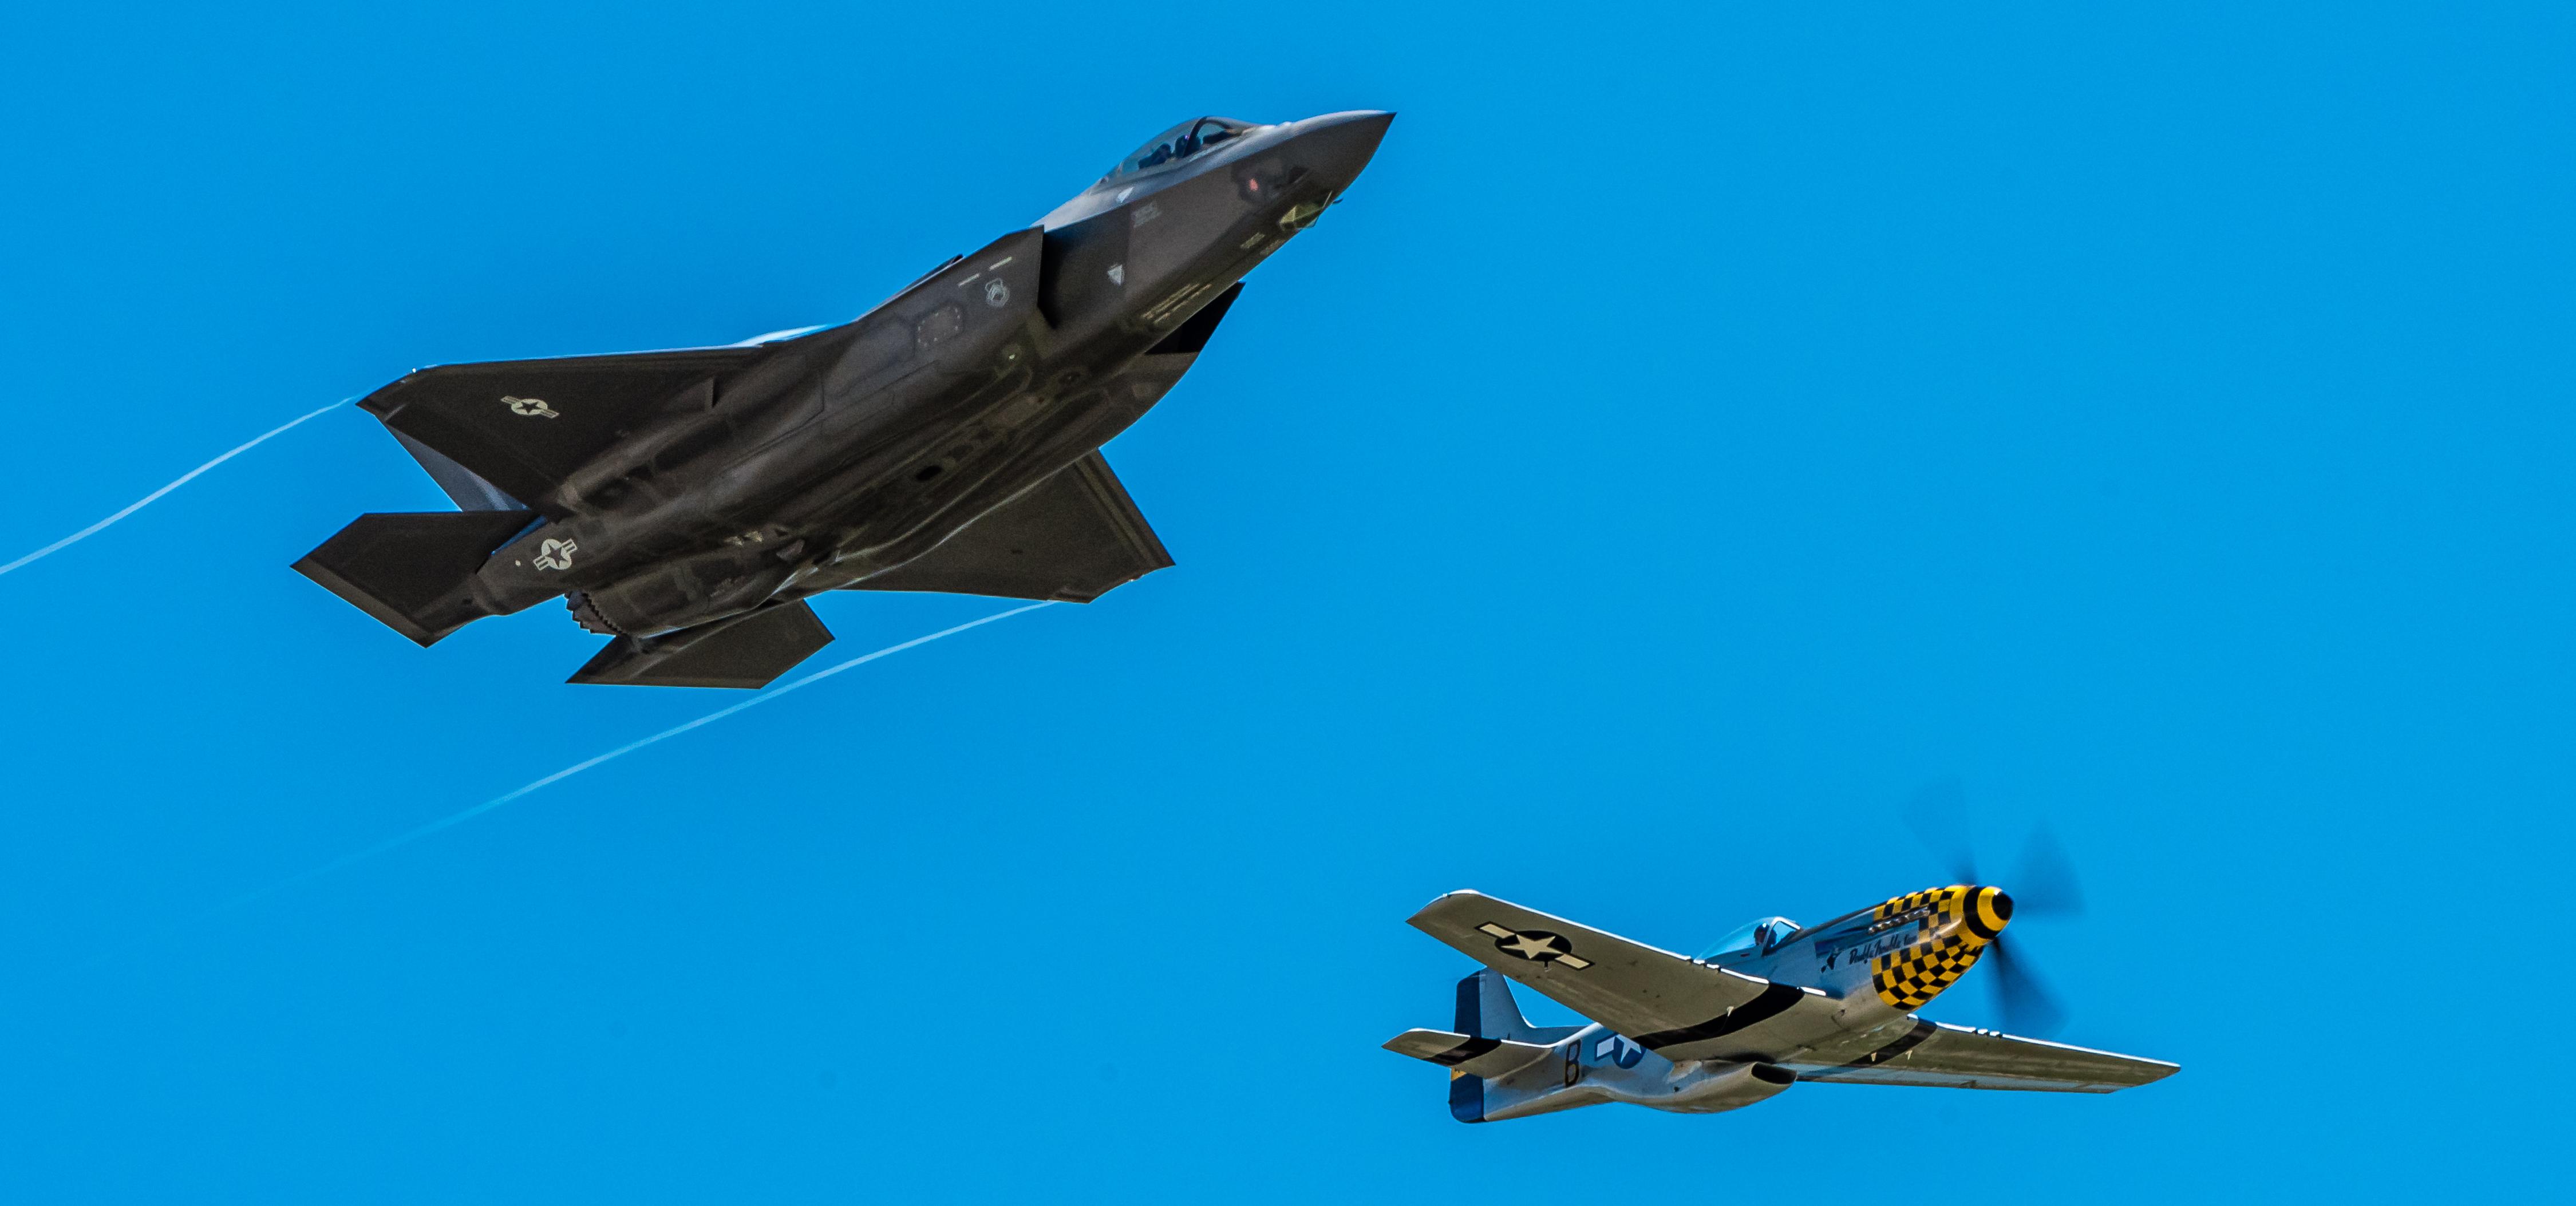 F-35, P-51